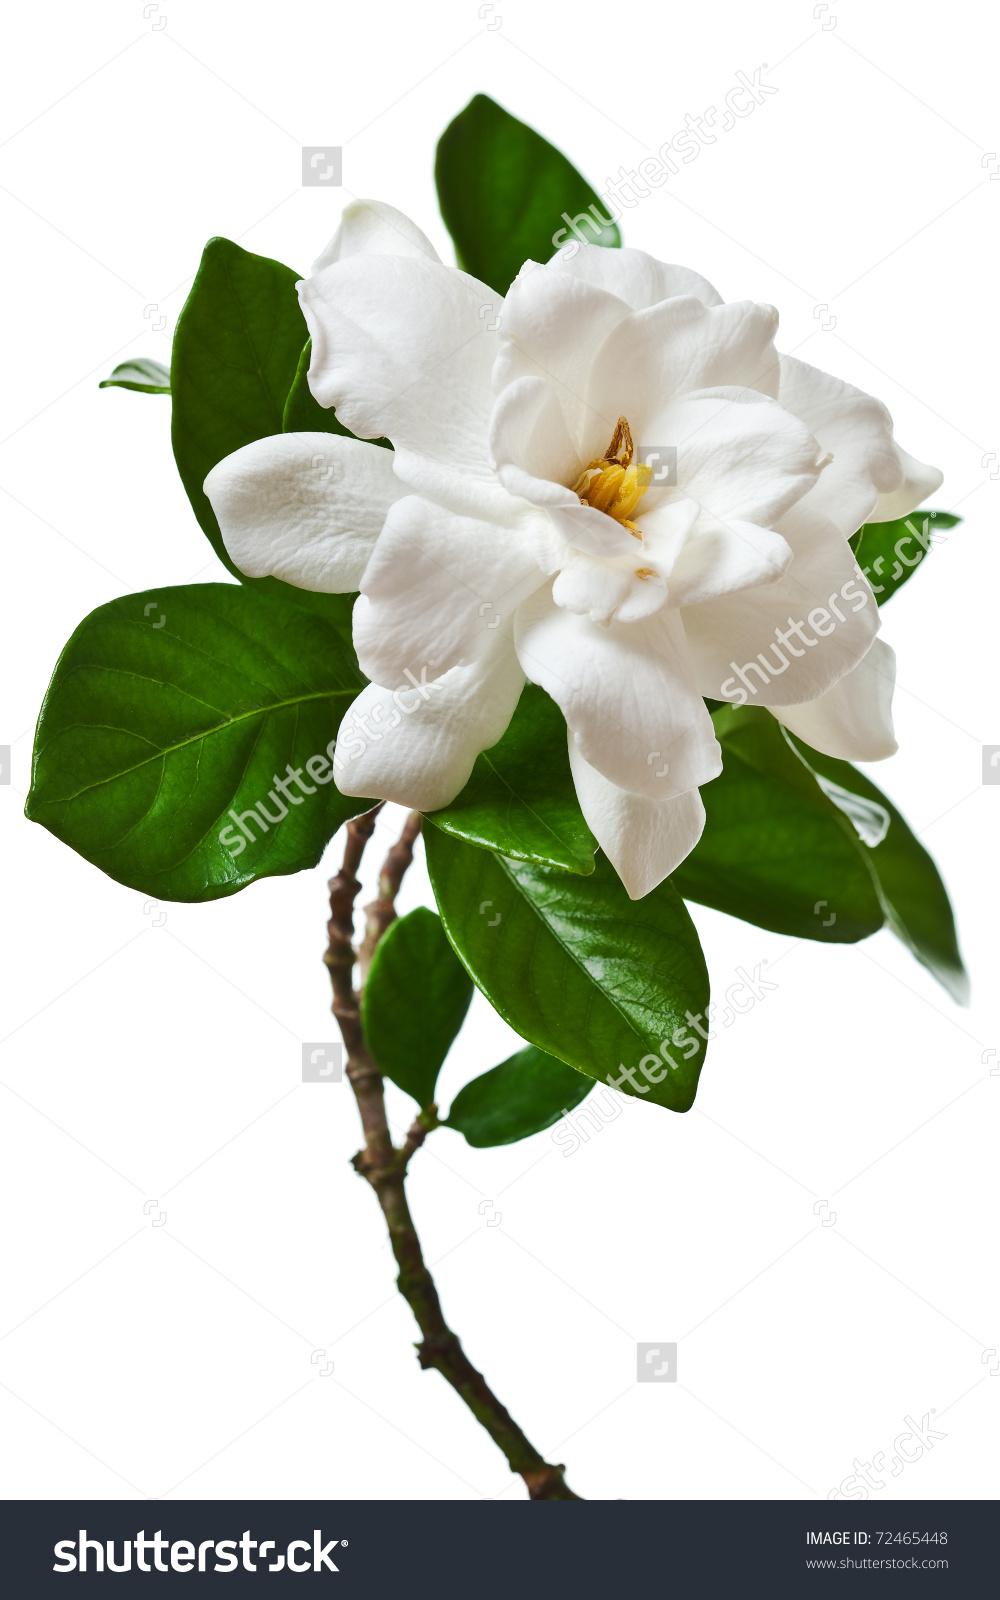 White Gardenia Blossom Isolated Stock Photo 72465448.